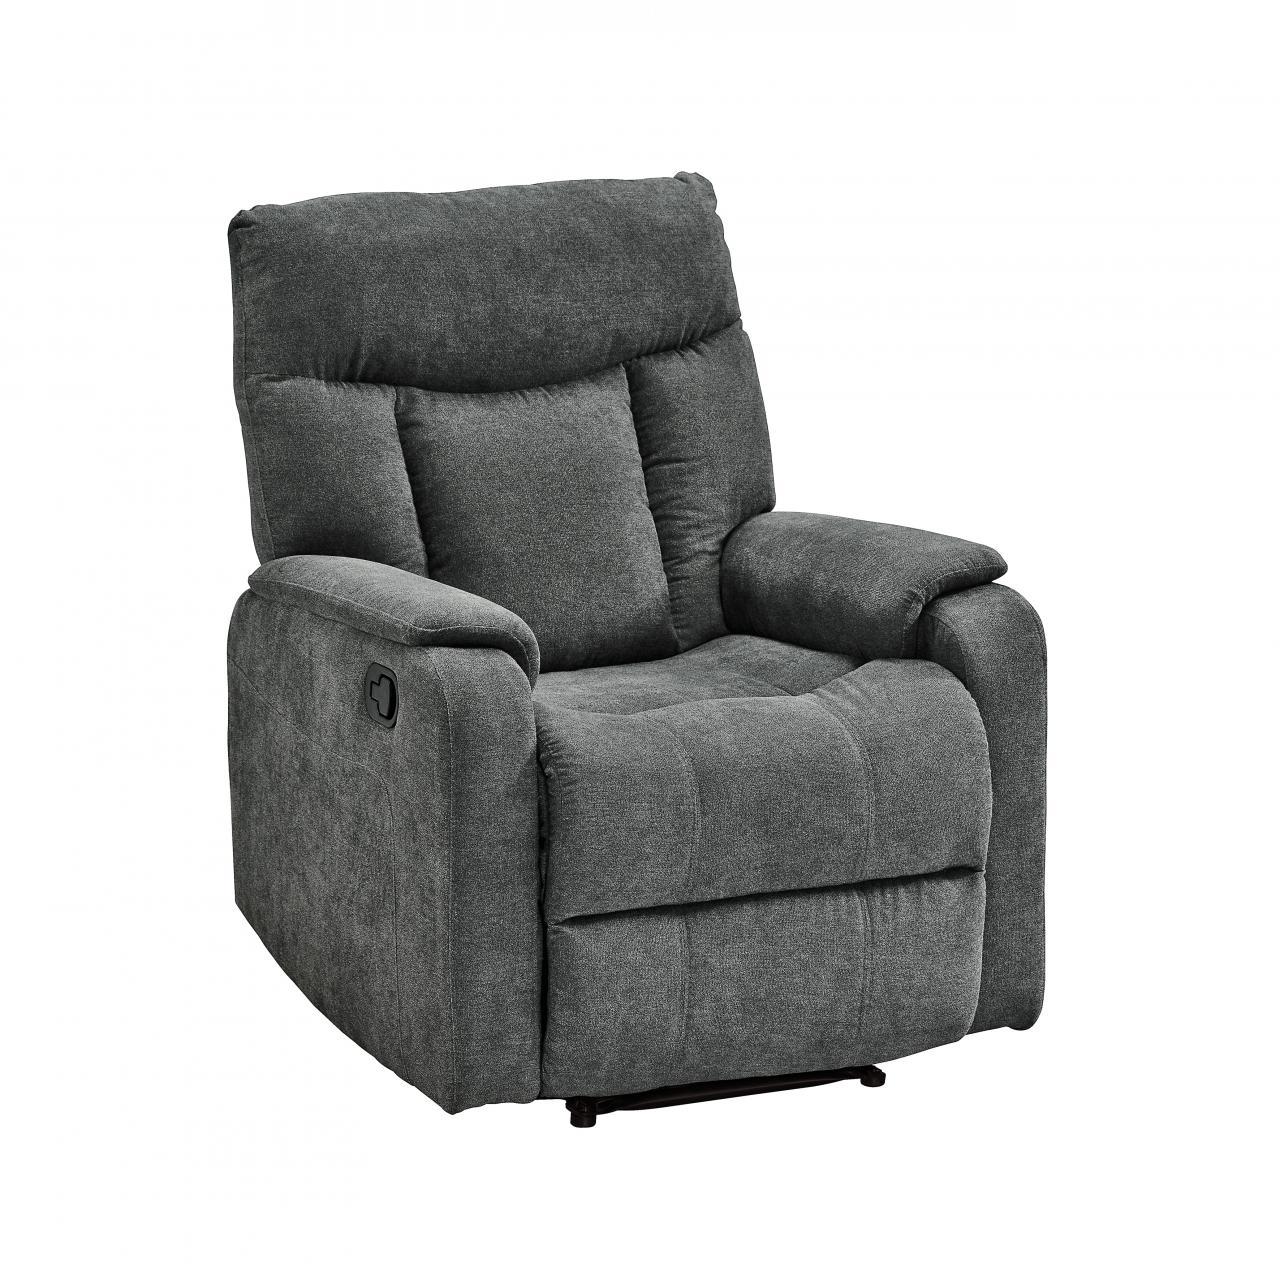 TV-Sessel 315-1 Grau Relaxliner Relaxsessel Sessel Polstermöbel Stoff